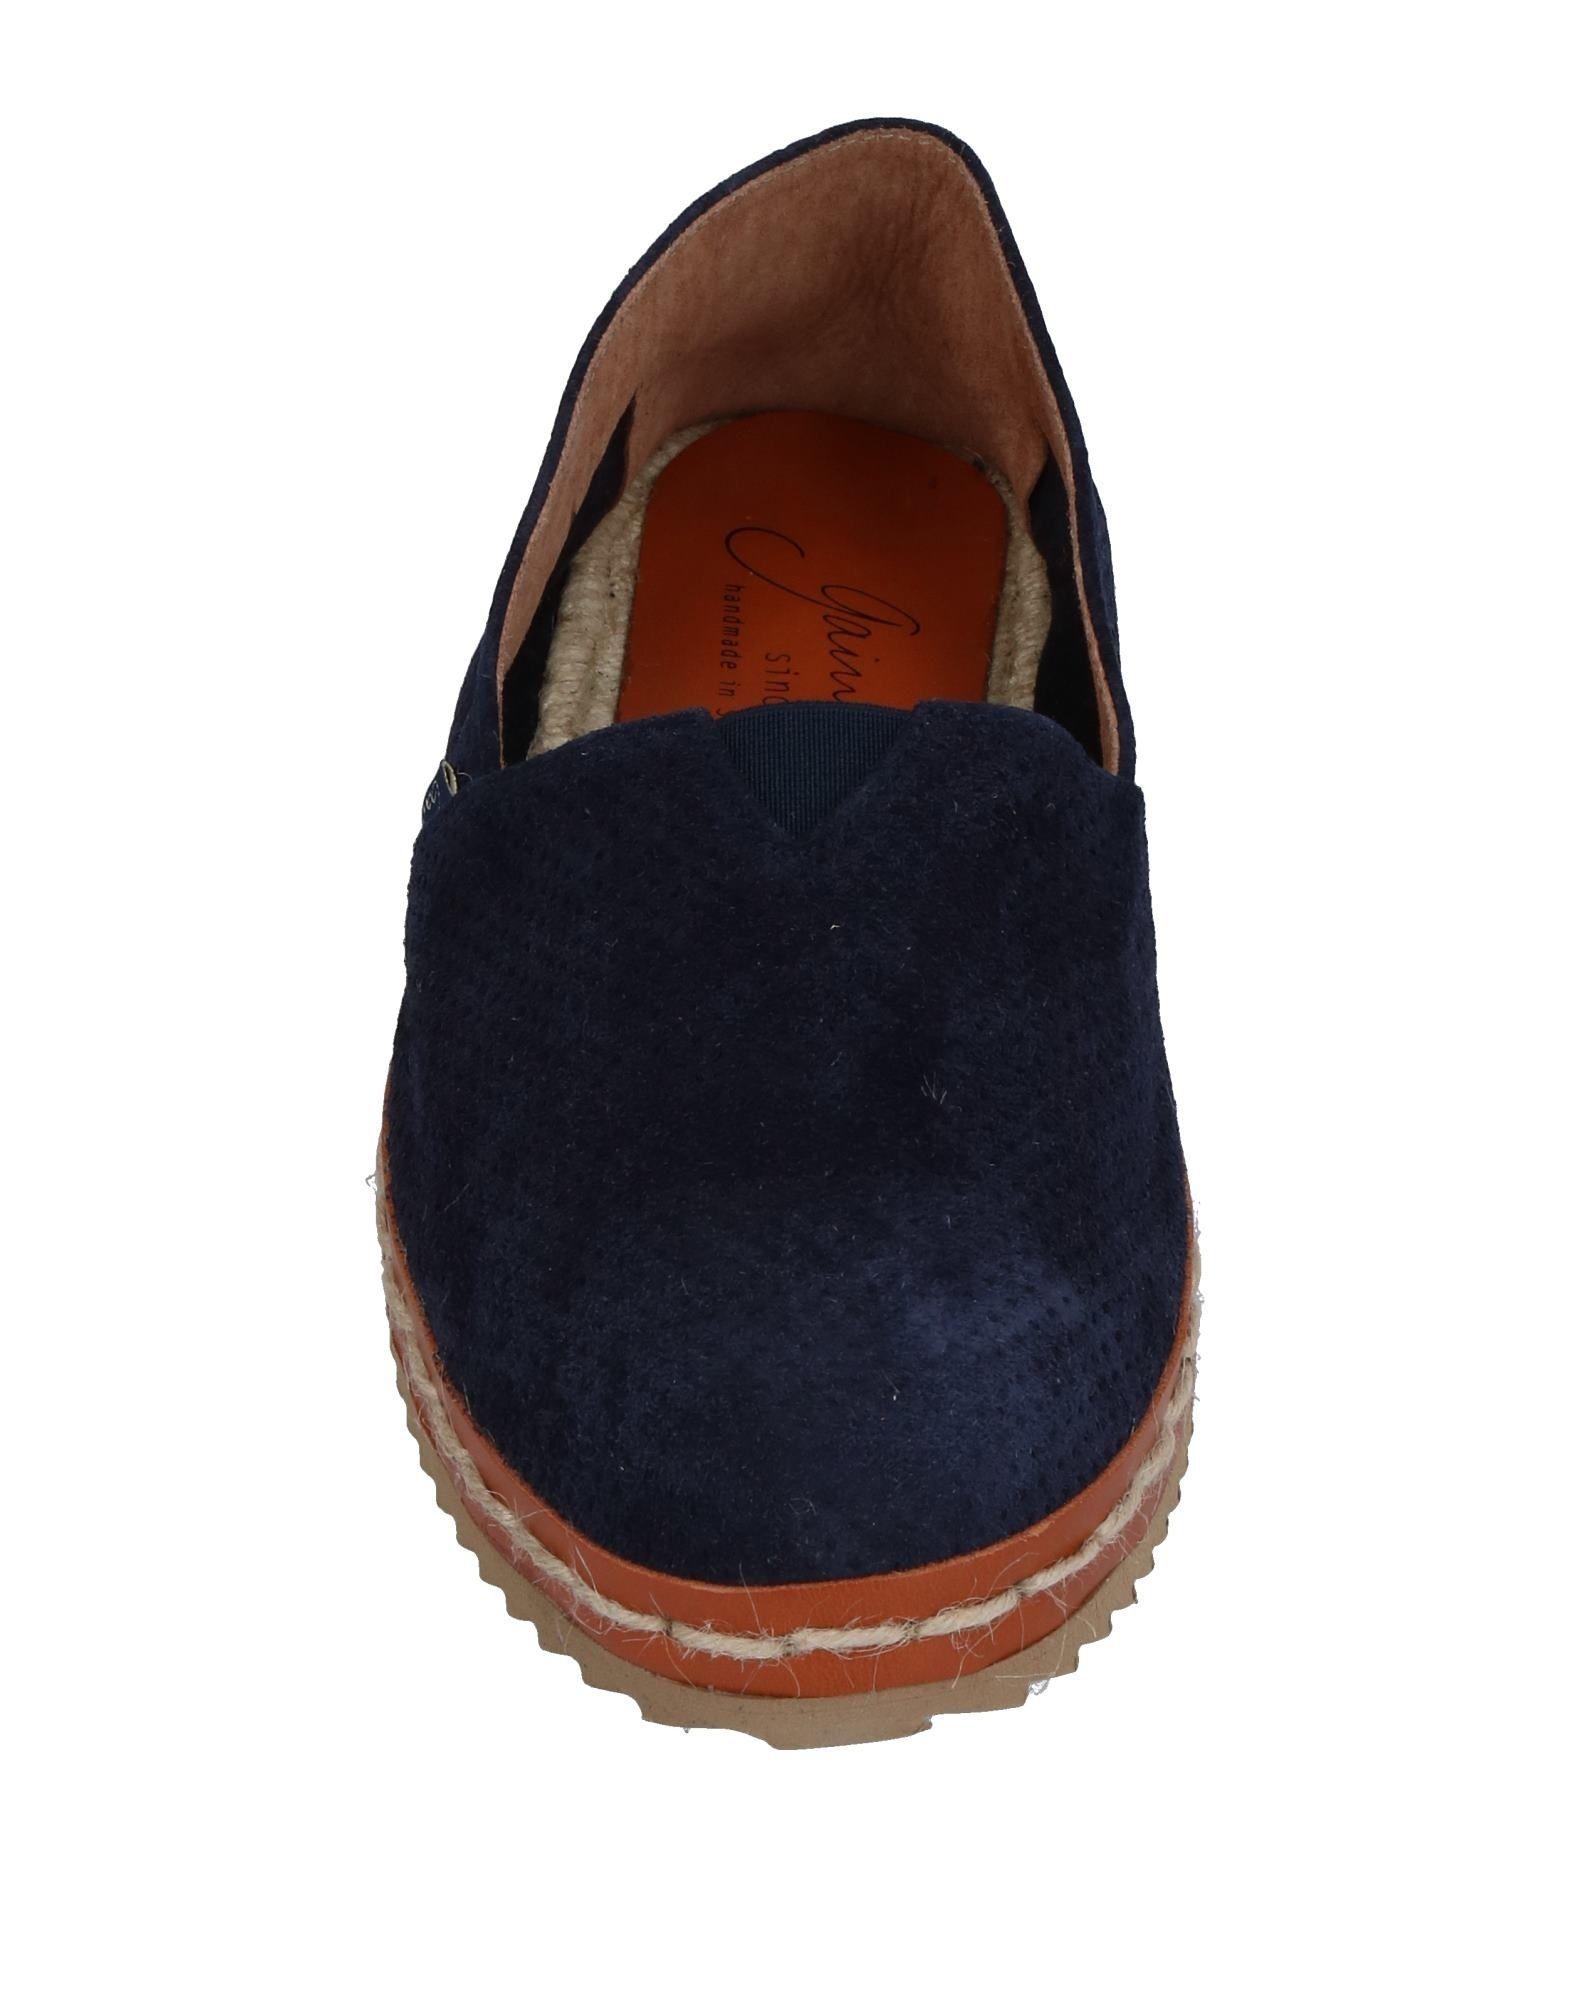 11381049BB Gaimo Espadrilles Herren  11381049BB  Heiße Schuhe 99c880